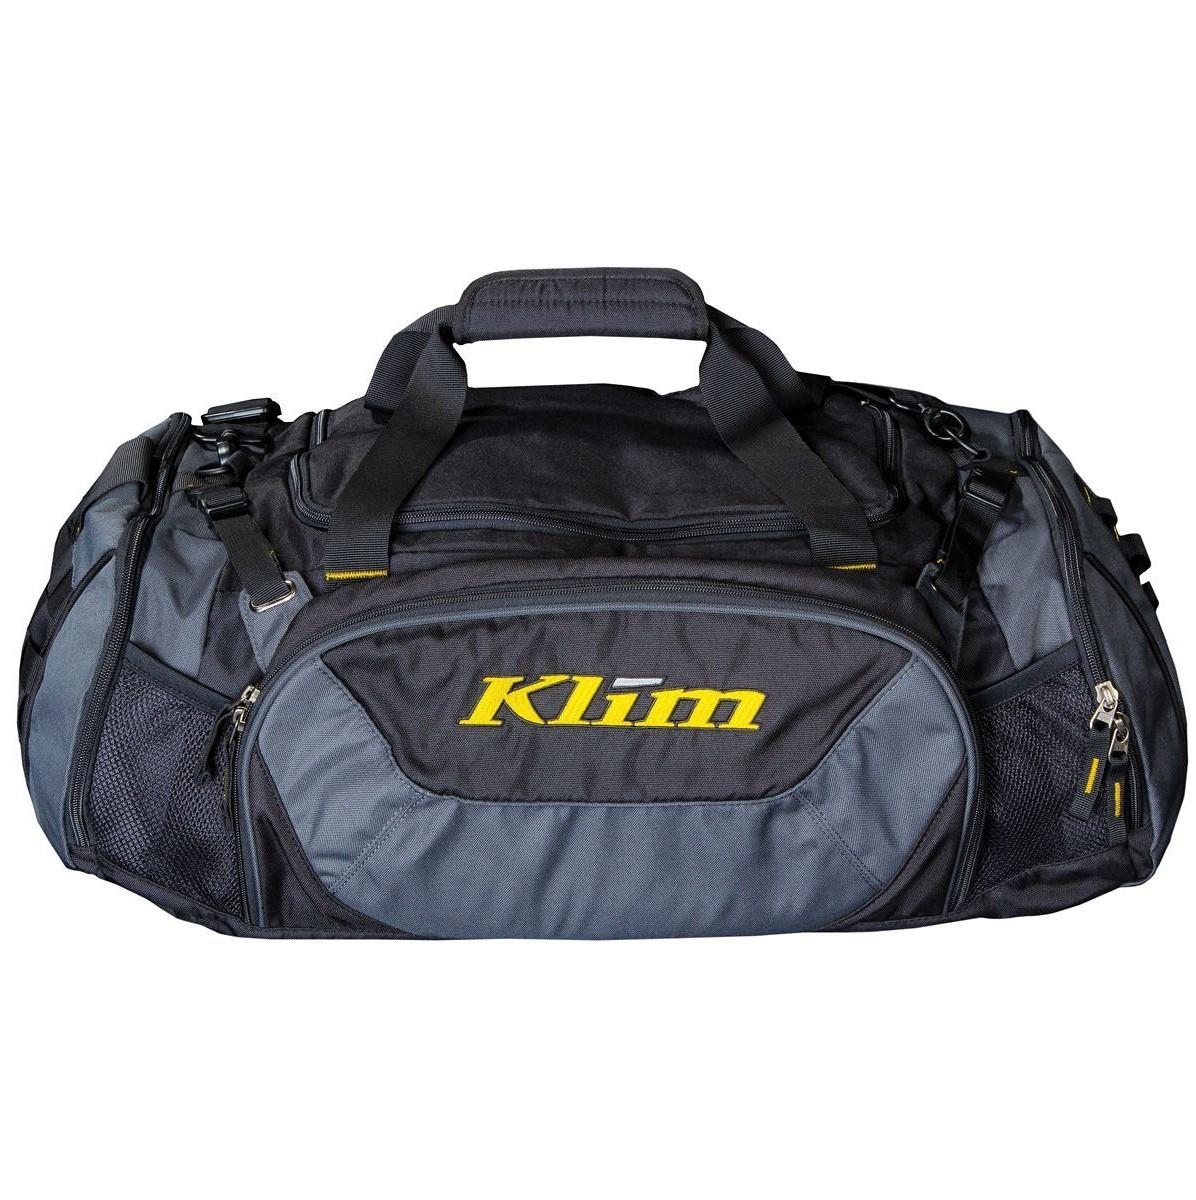 Klim Kilm Duffle Bag 2014  2014-klim-duffle-bag-mcss.jpg